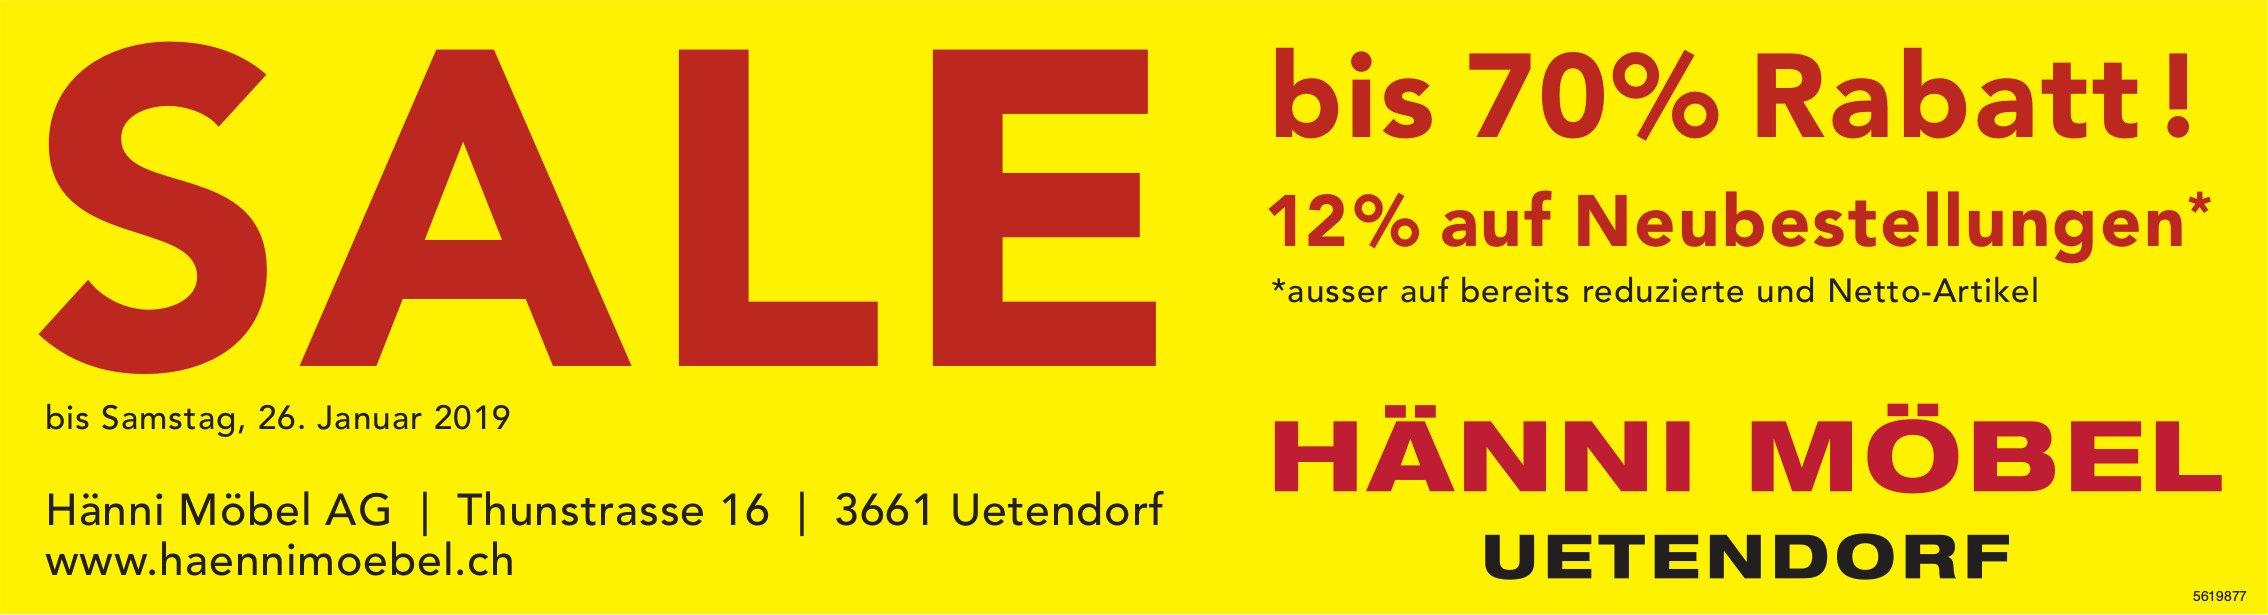 SALE bis 70% Rabatt!, HÄNNI MÖBEL, UETENDORF